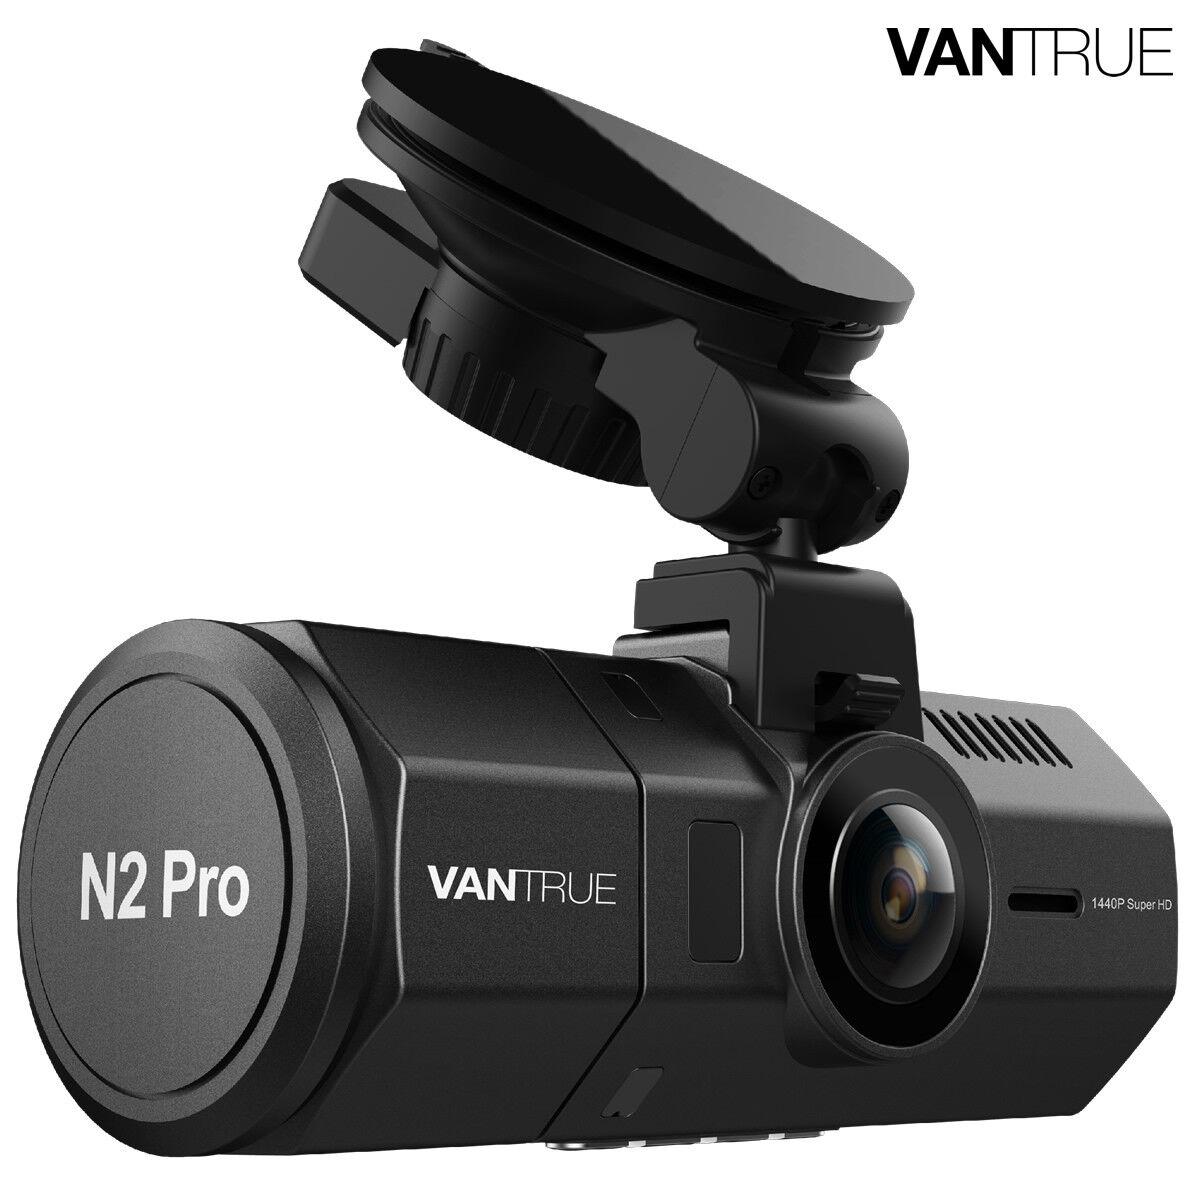 Vantrue N2 Pro Uber Dual Dash Cam Vehicle Cam Recorder, Nigh